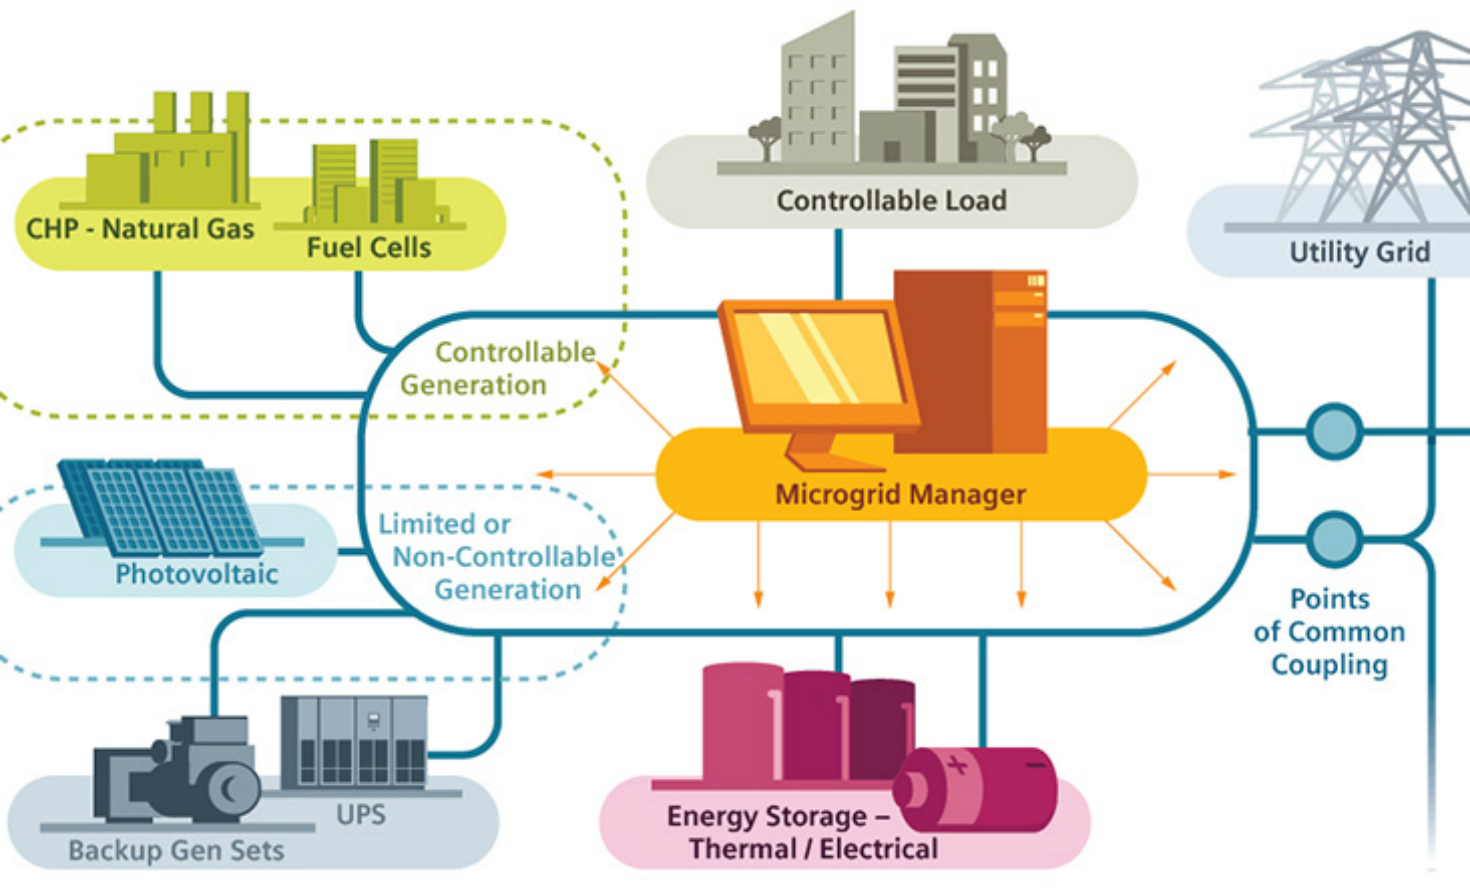 Siemens Microgrid Diagram Png 1470 894 Renewable Energy News Energy Energy Storage